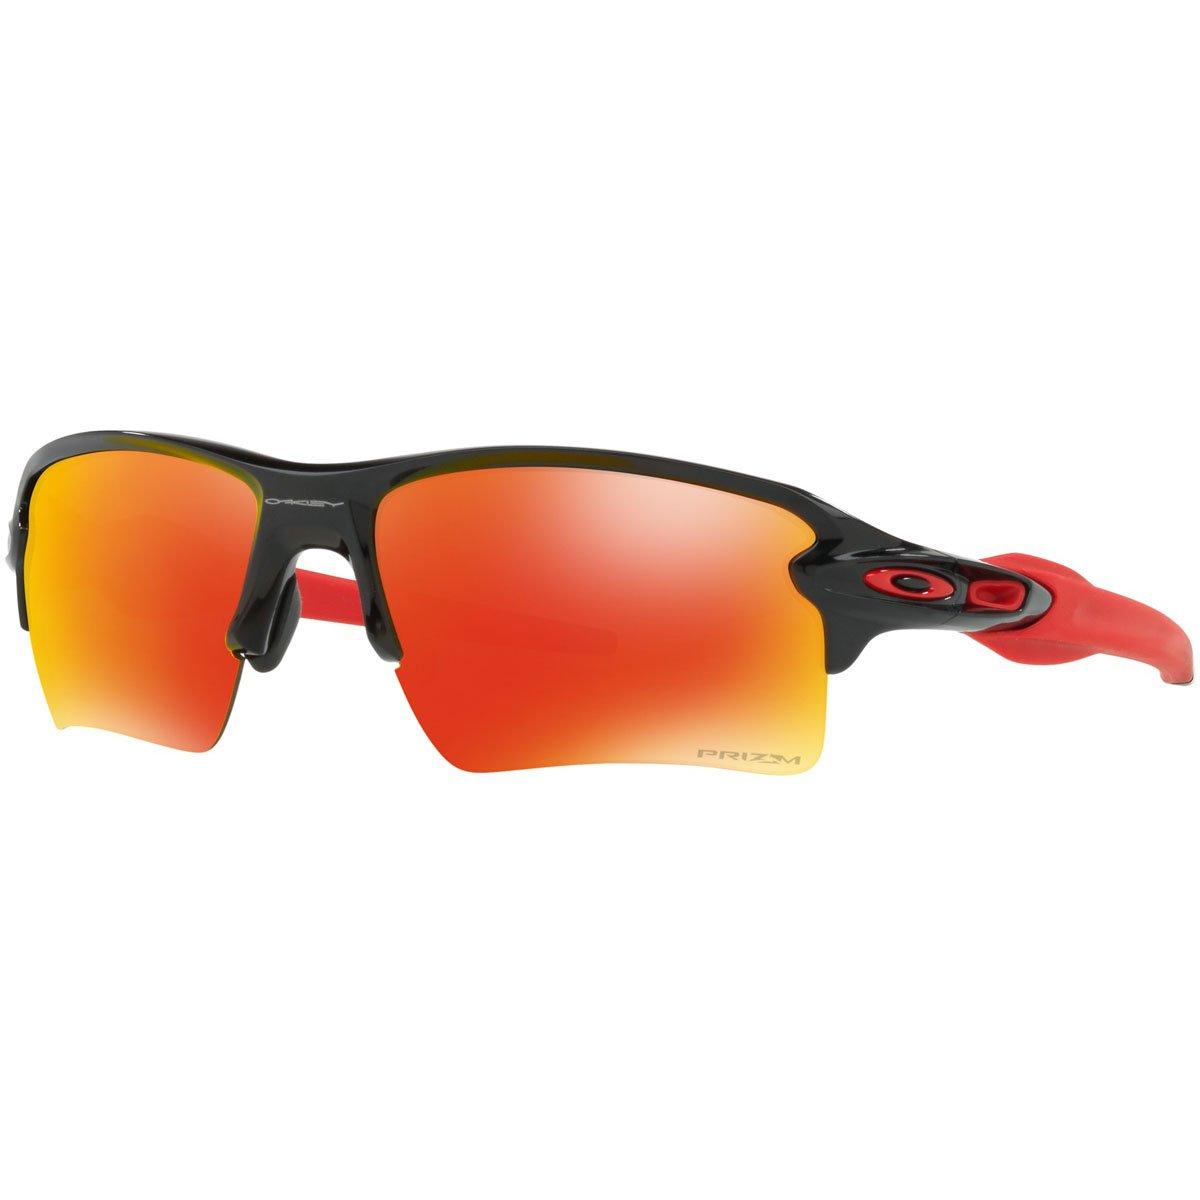 Oakley Men's OO9188 Flak 2.0 XL Rectangular Sunglasses, Polished Black/Prizm Ruby, 59 mm by Oakley